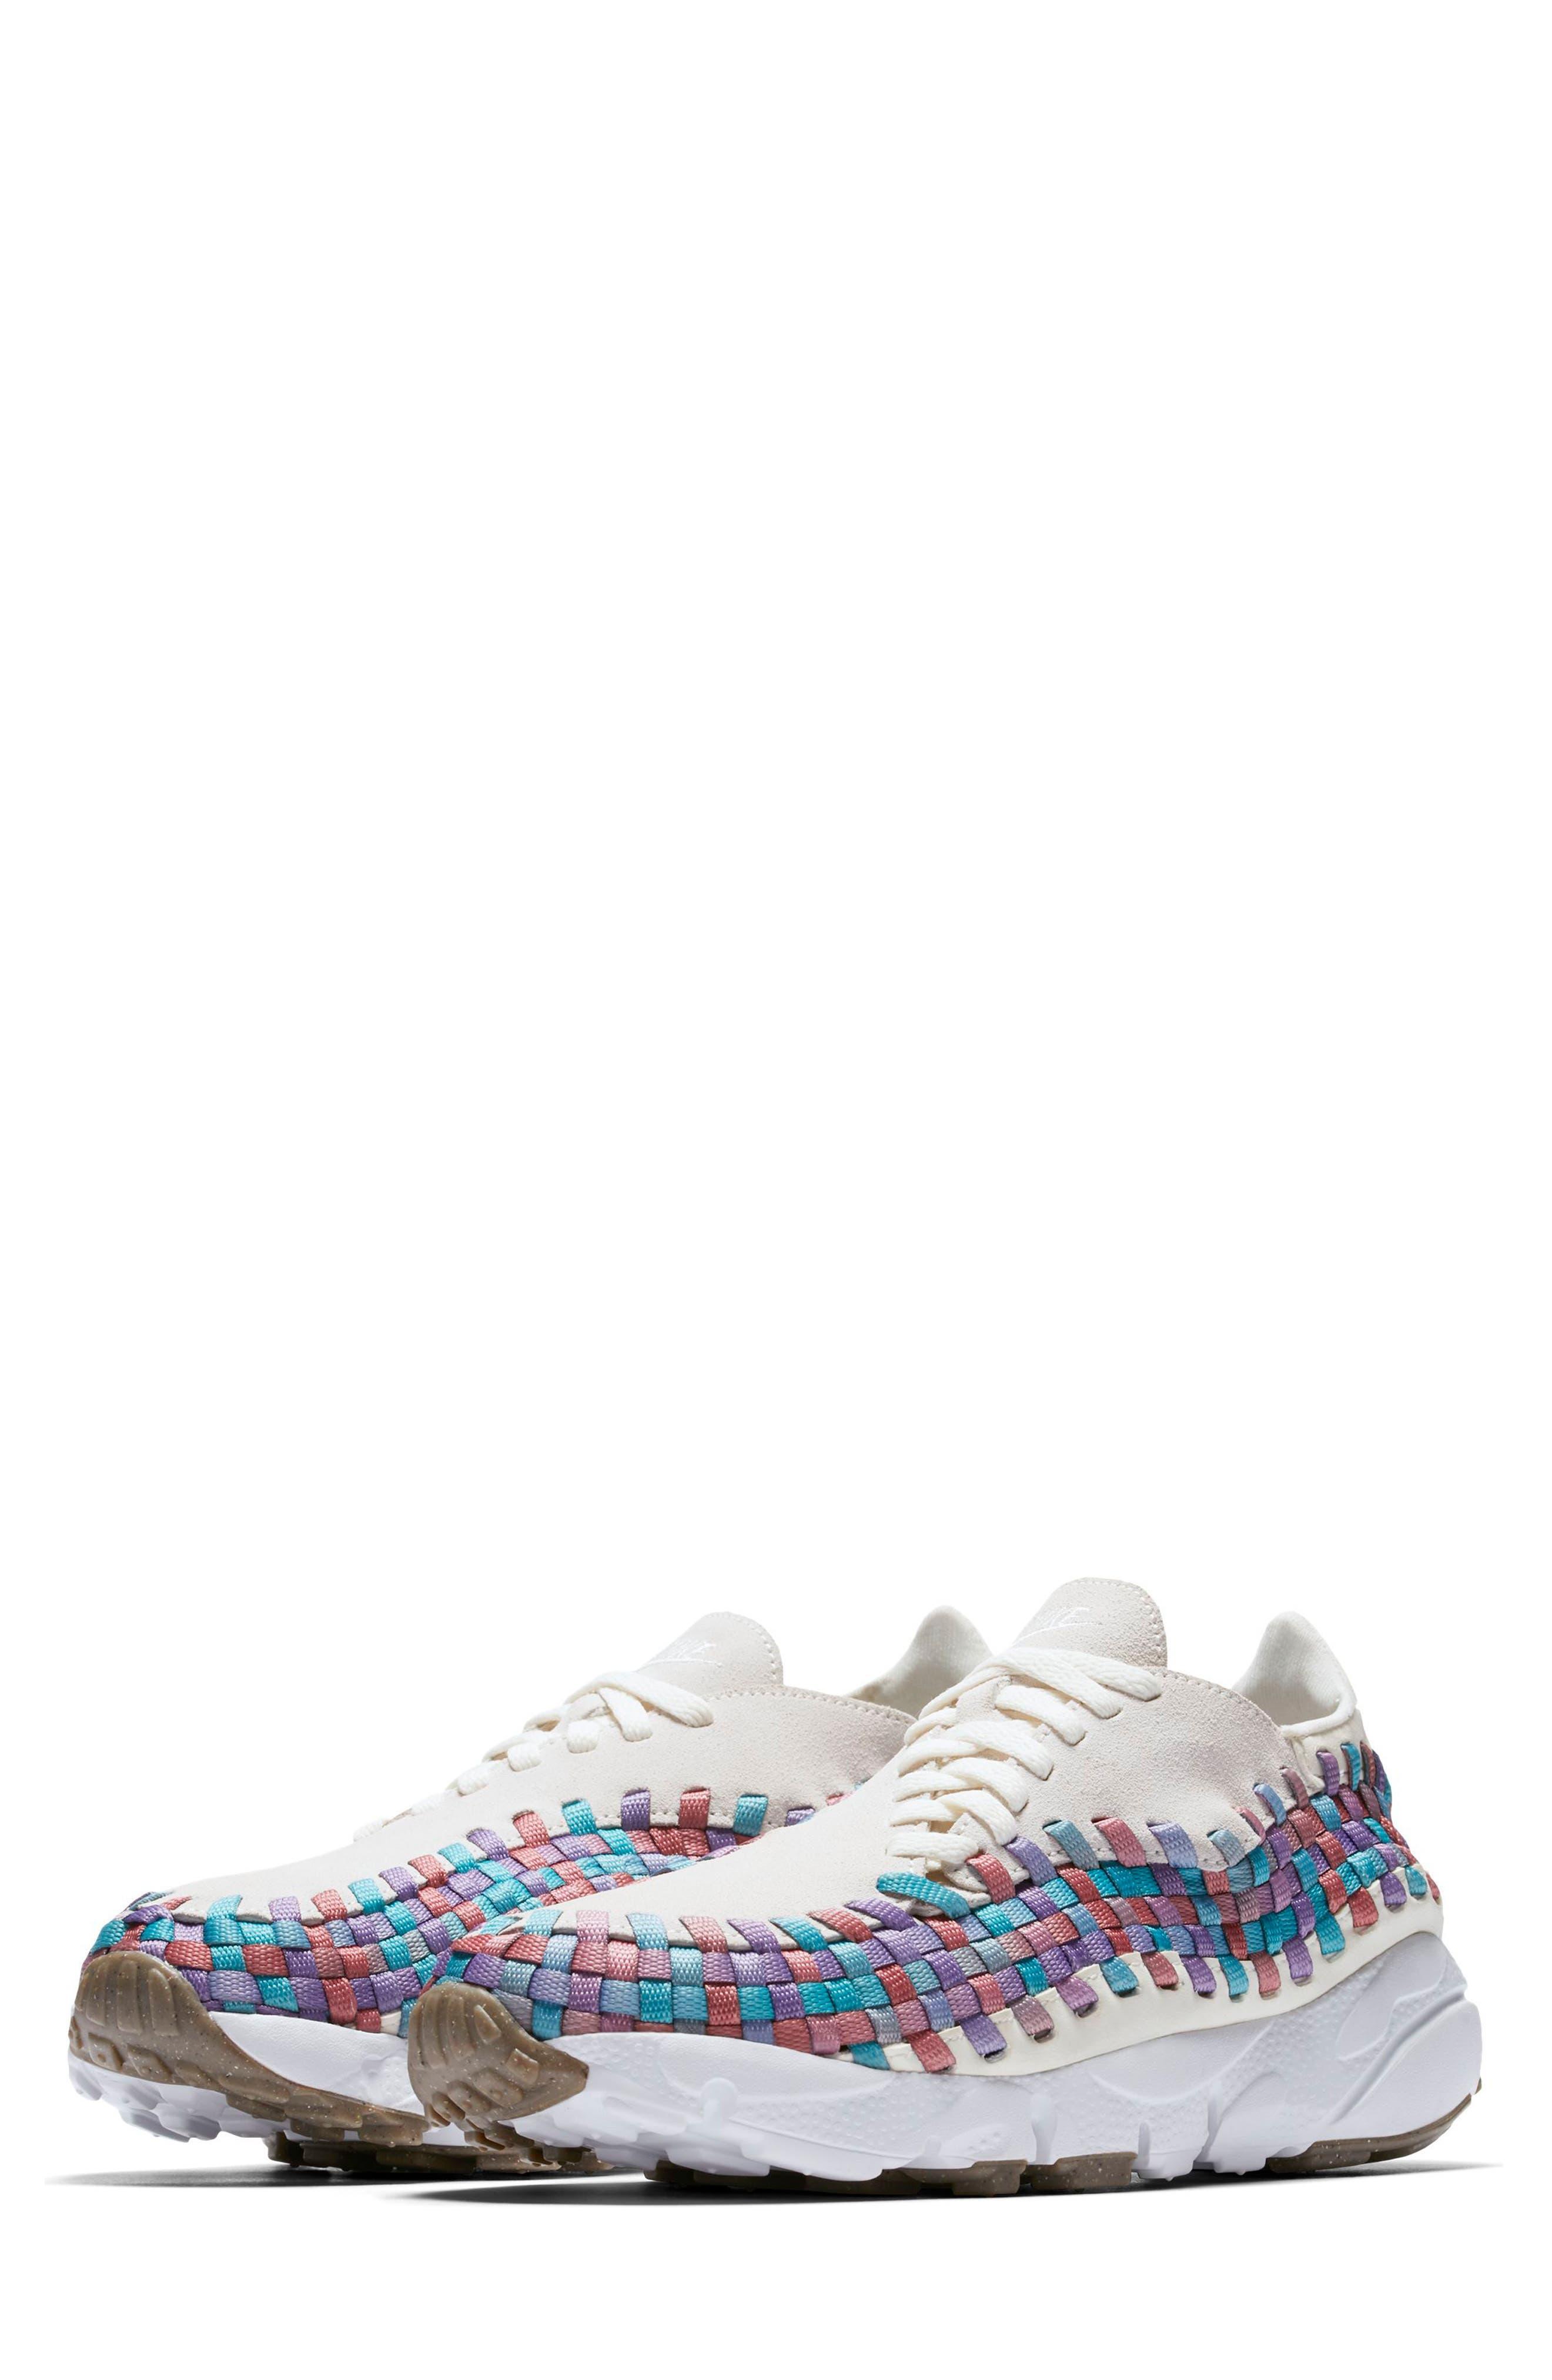 Main Image - Nike Air Footscape Woven Sneaker (Women)